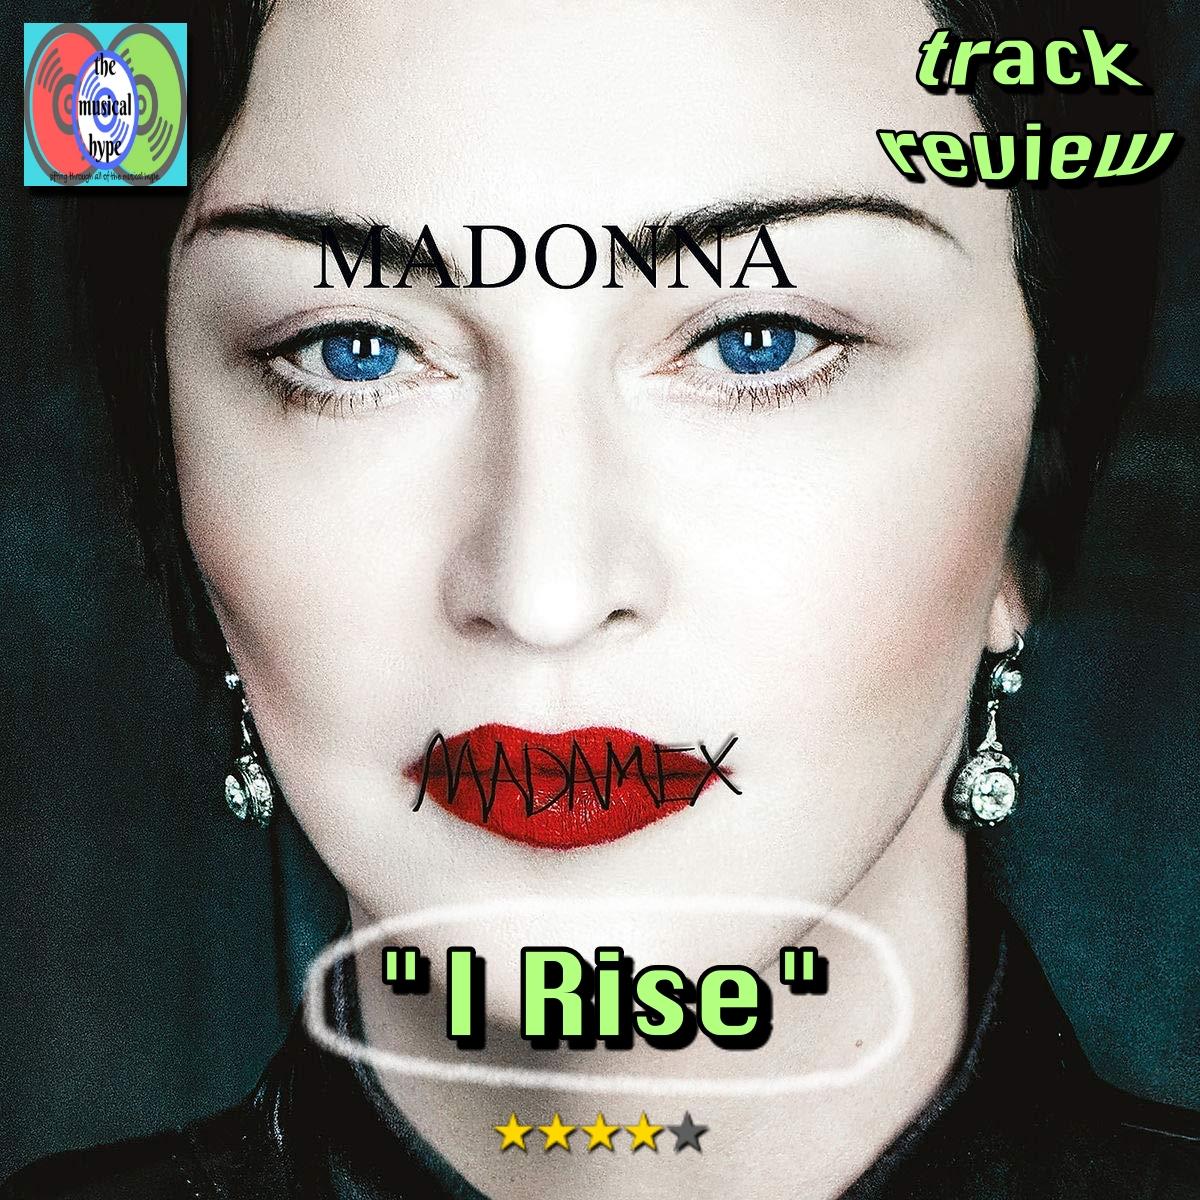 Madonna, I Rise | Track Review